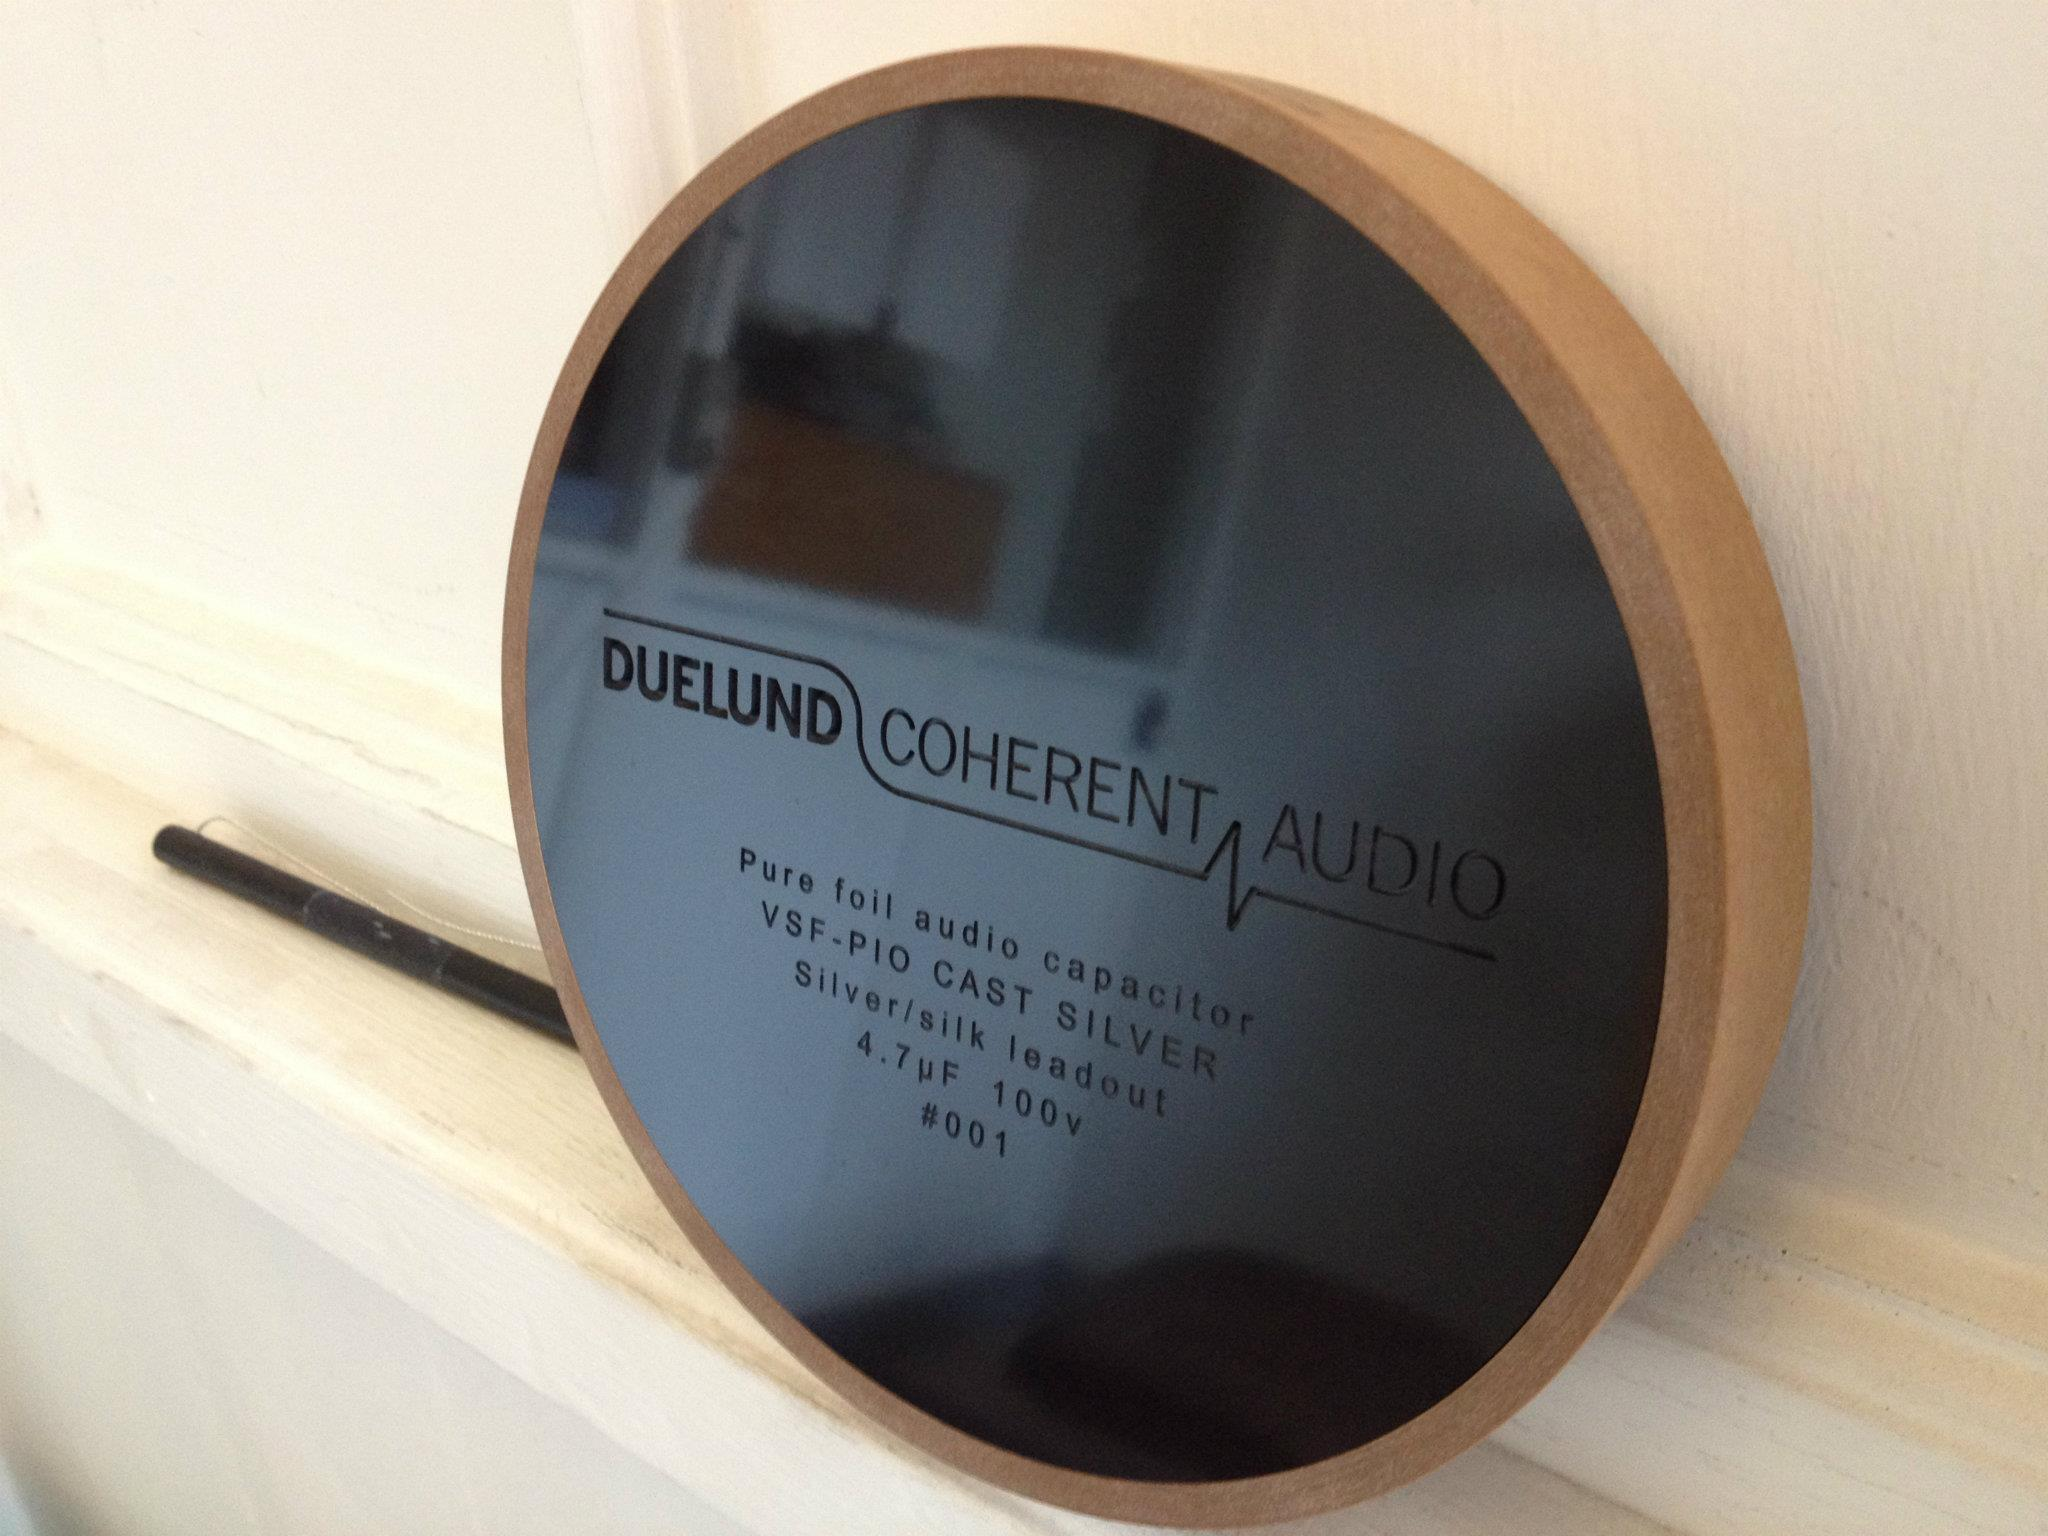 Duelund Coherent Audio – Manufacturers of loudspeakers